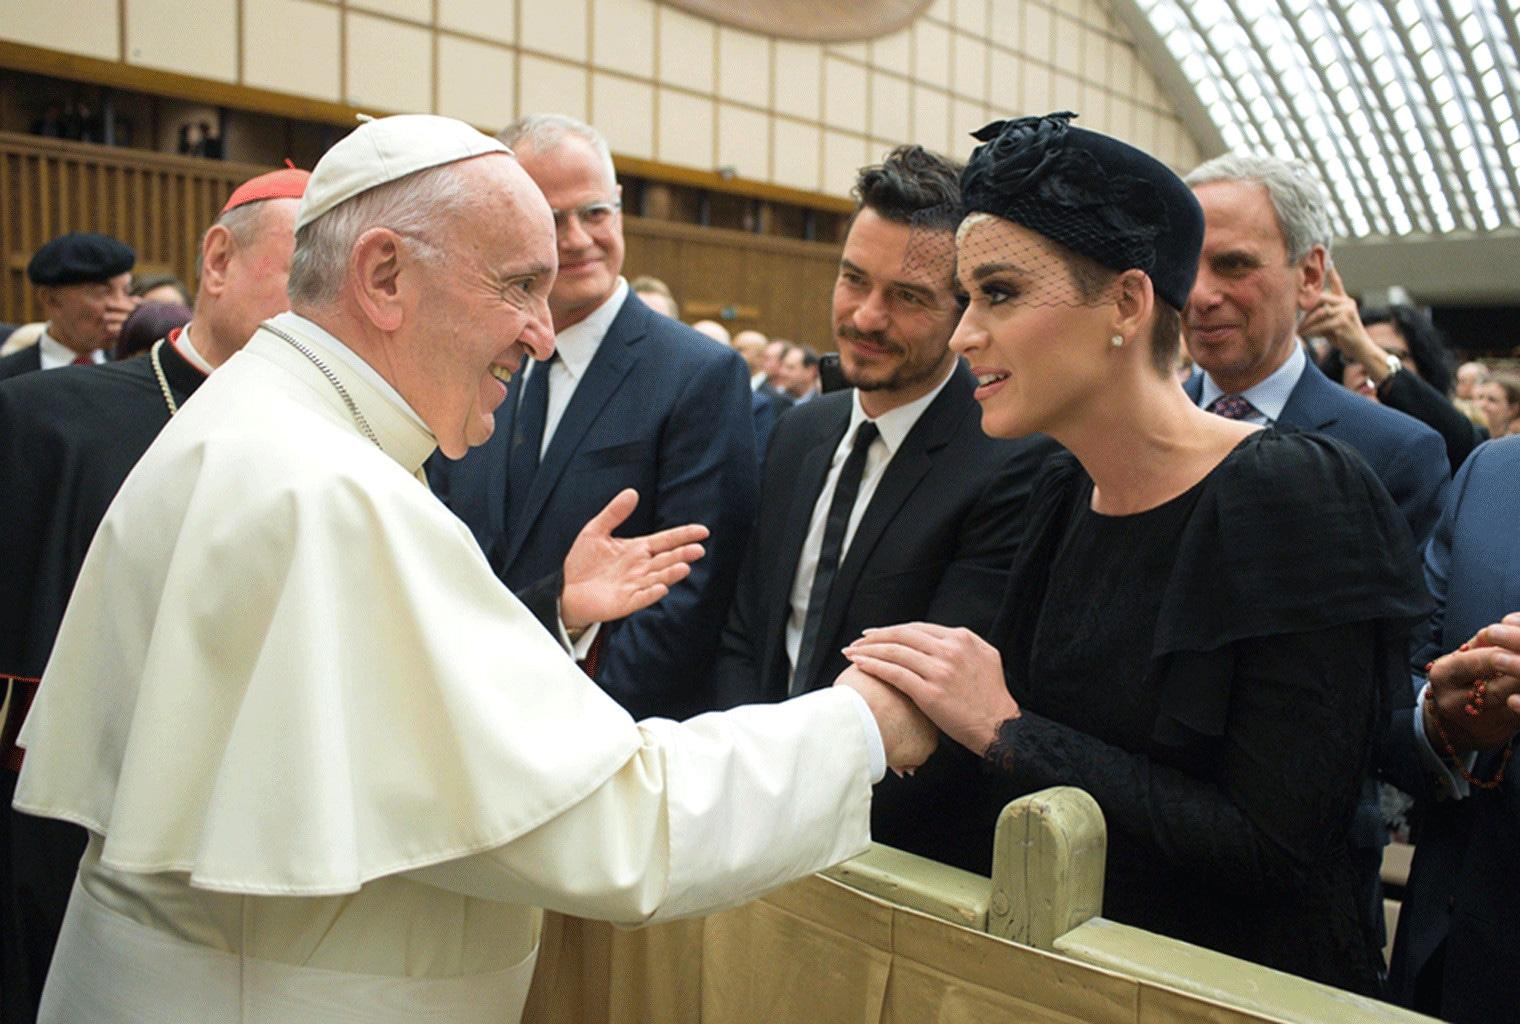 Katy Perry, Orlando Bloom, Pope Francis